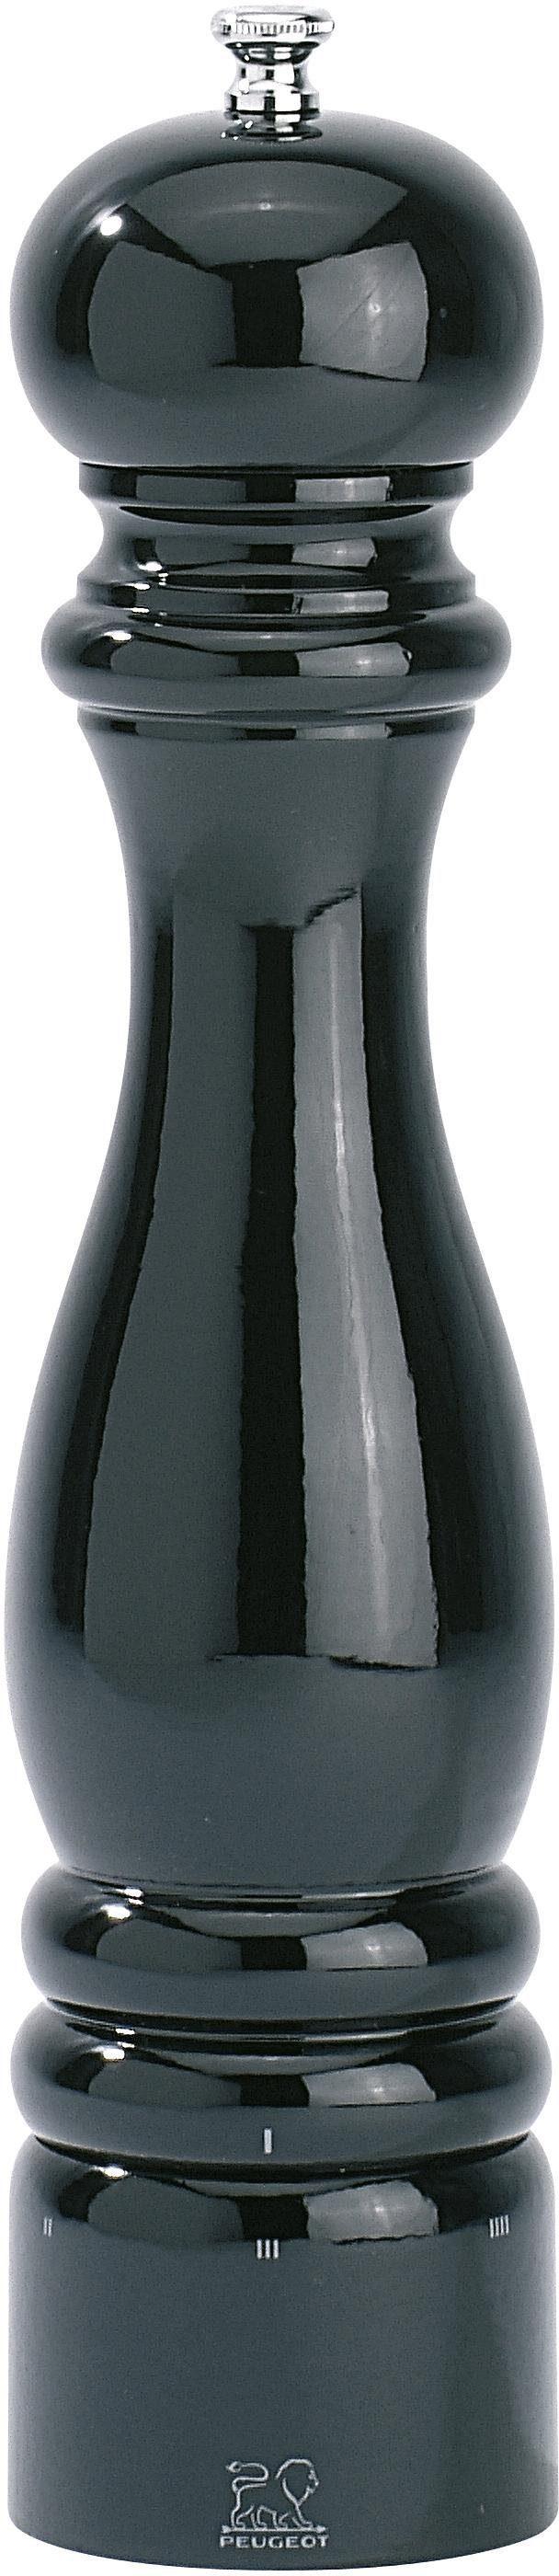 PEUGEOT Pfeffermühle »Paris U'Select« manuell, 30 cm